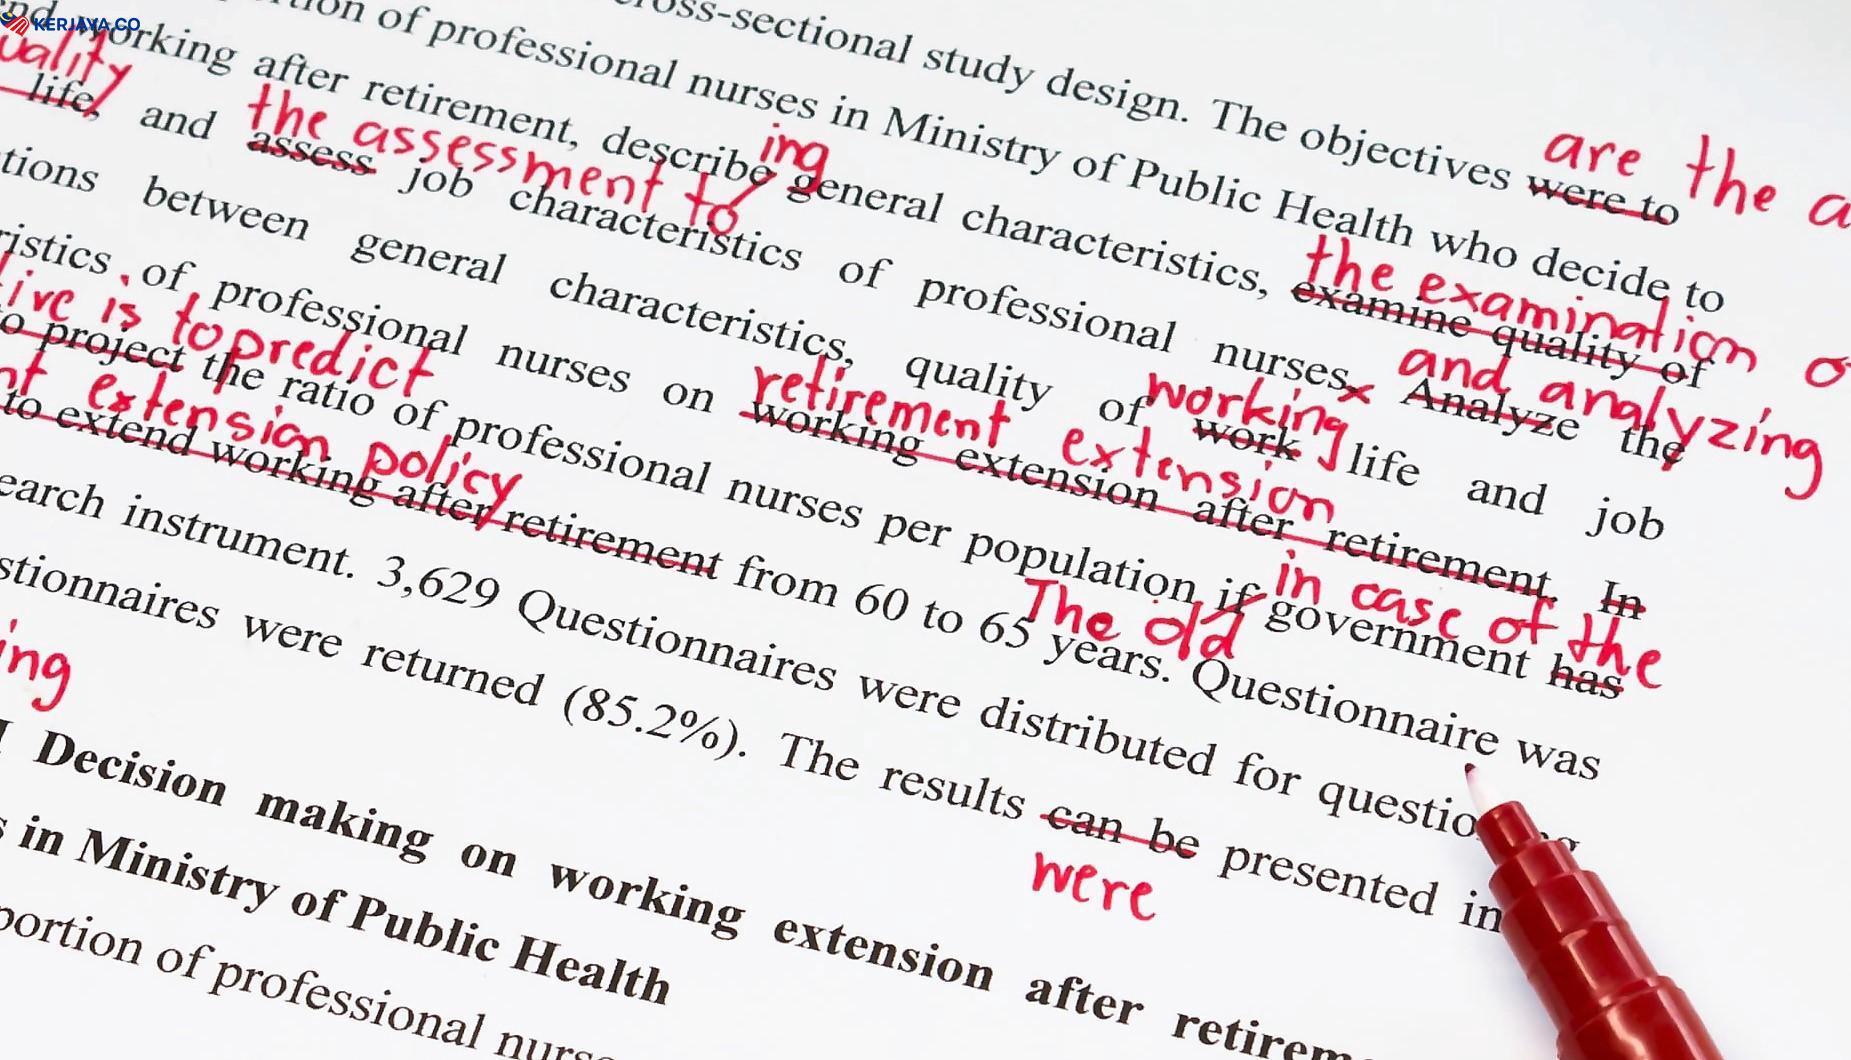 Cover Letter Checklist: Apa Nak Buat Sebelum Hantar Kepada Majikan?